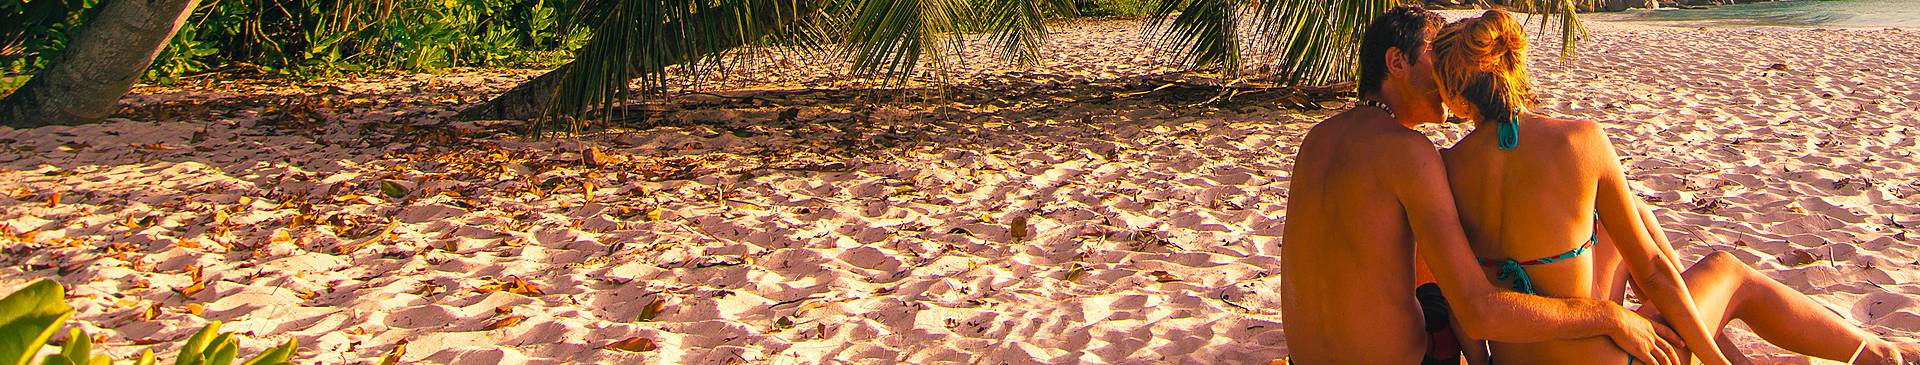 Flitterwochen Seychellen